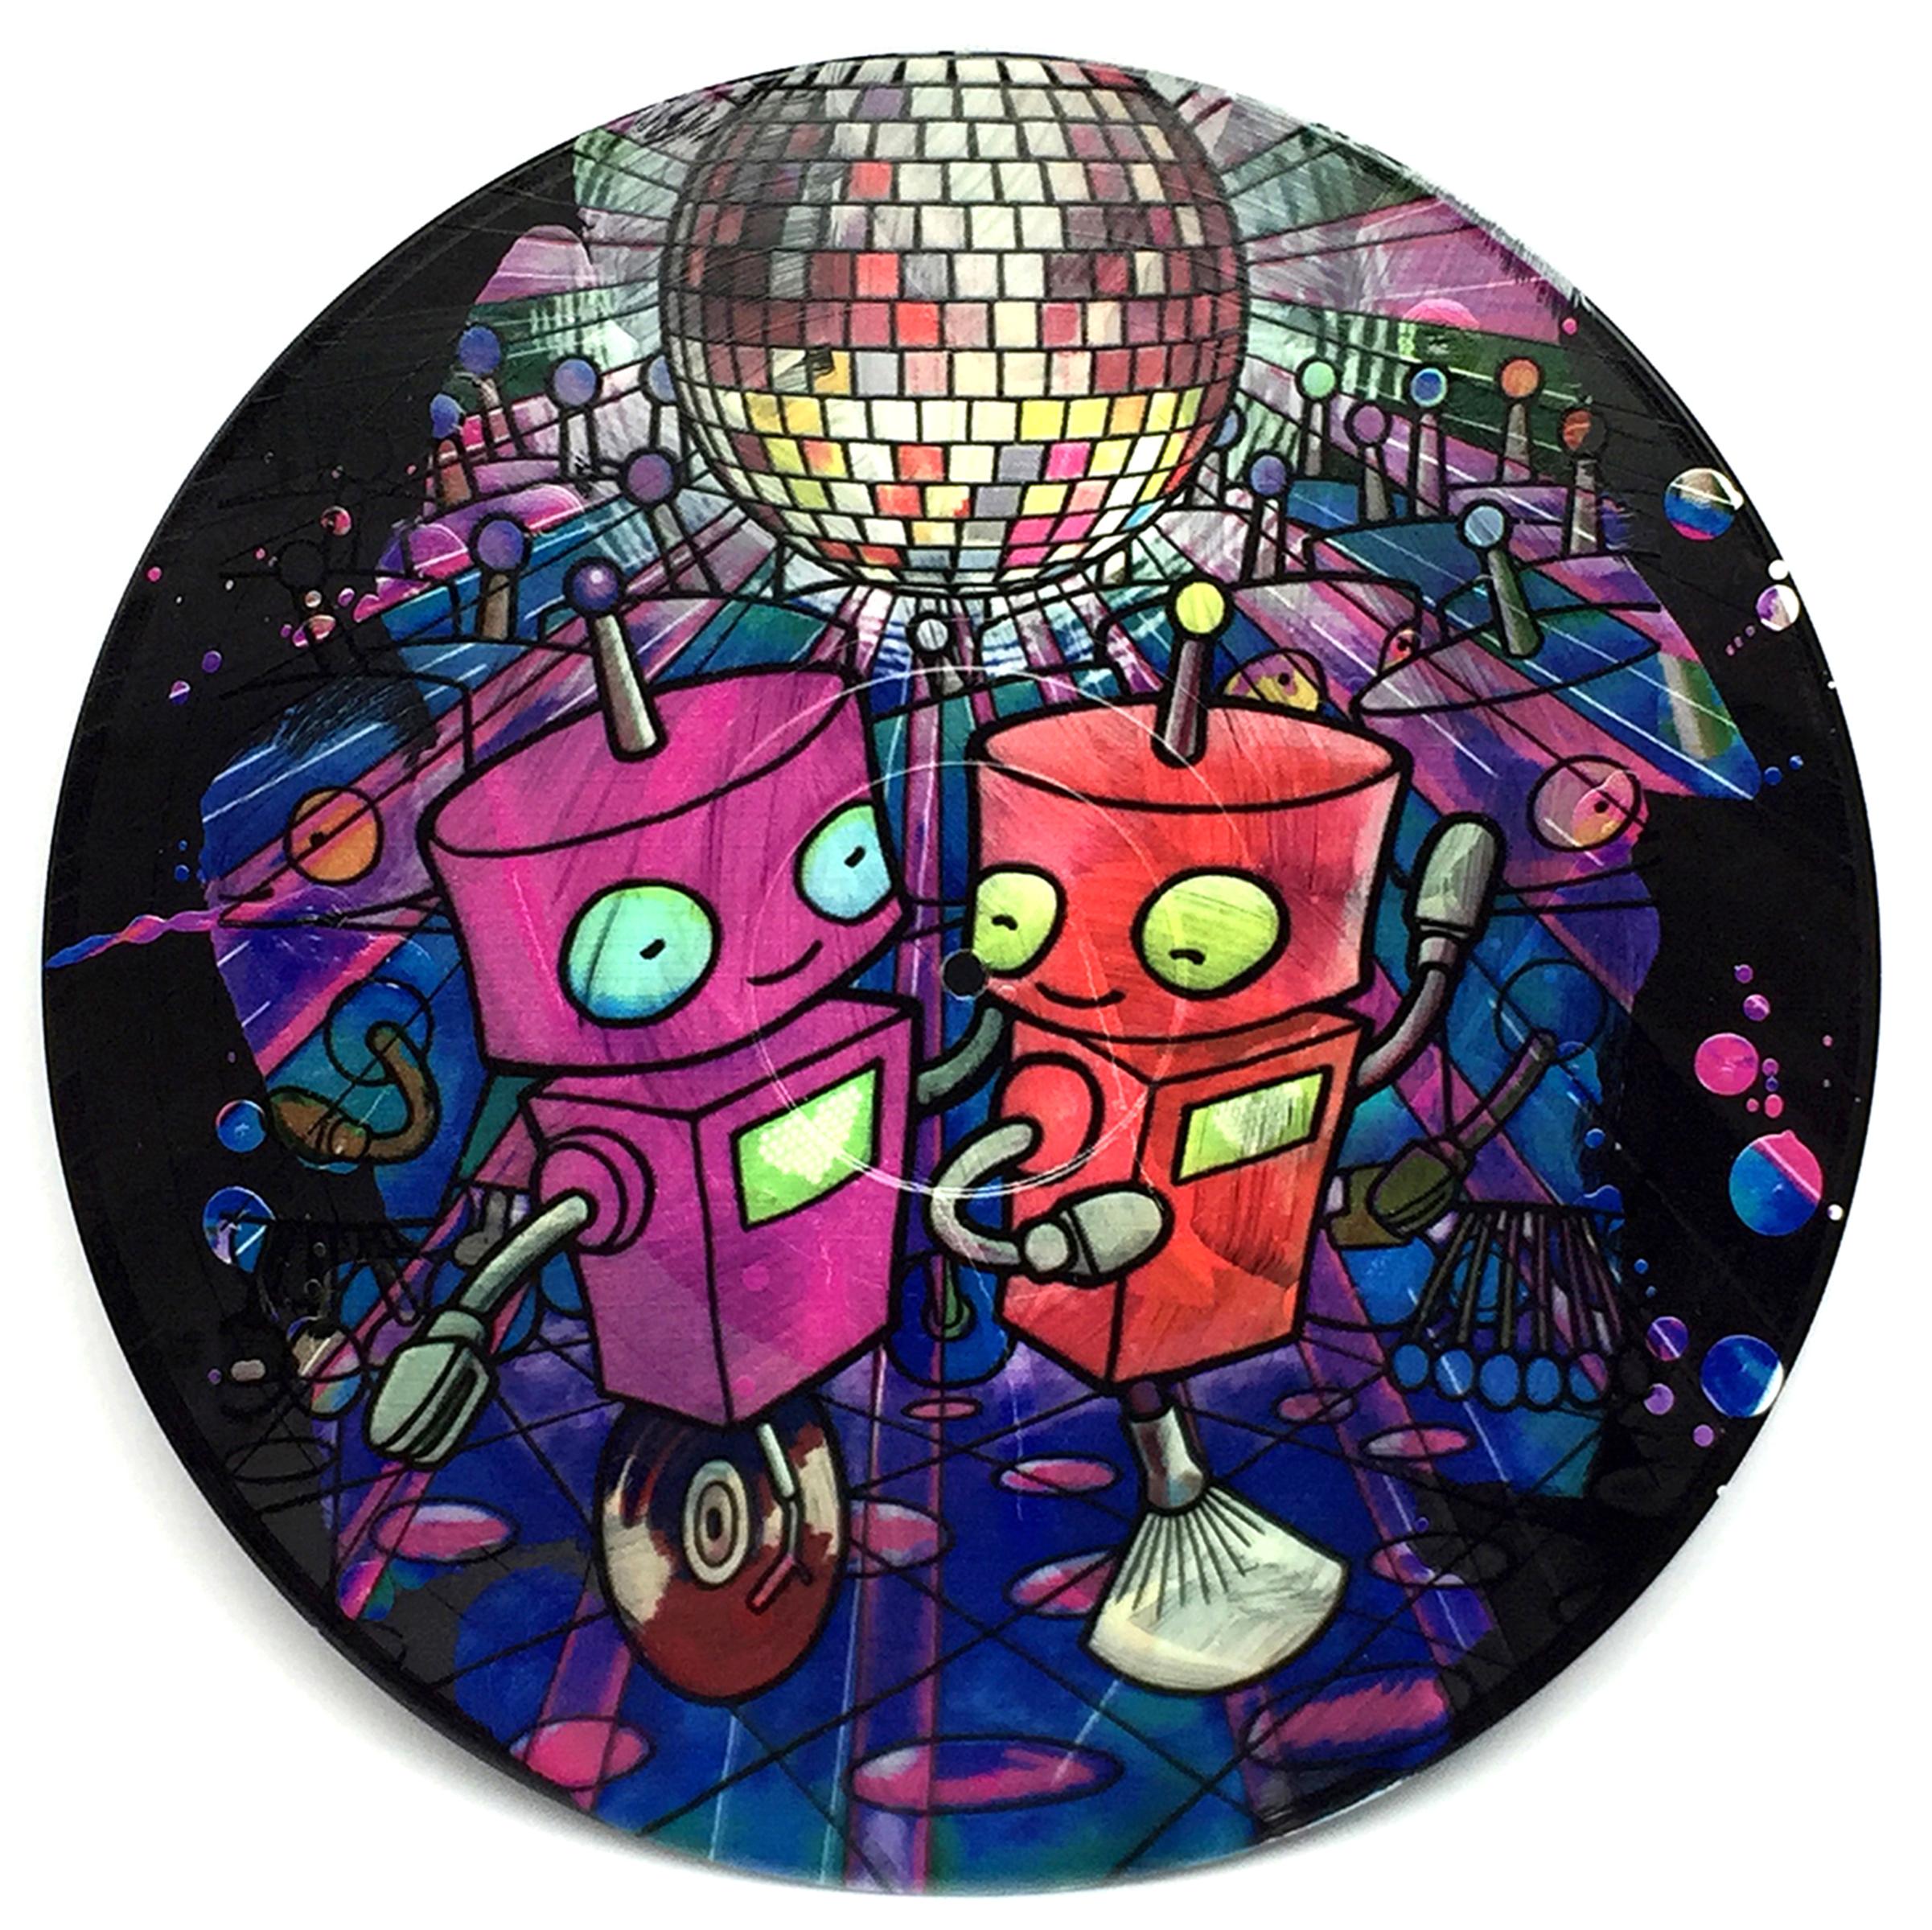 B Sides - Disco - click to download hi res file